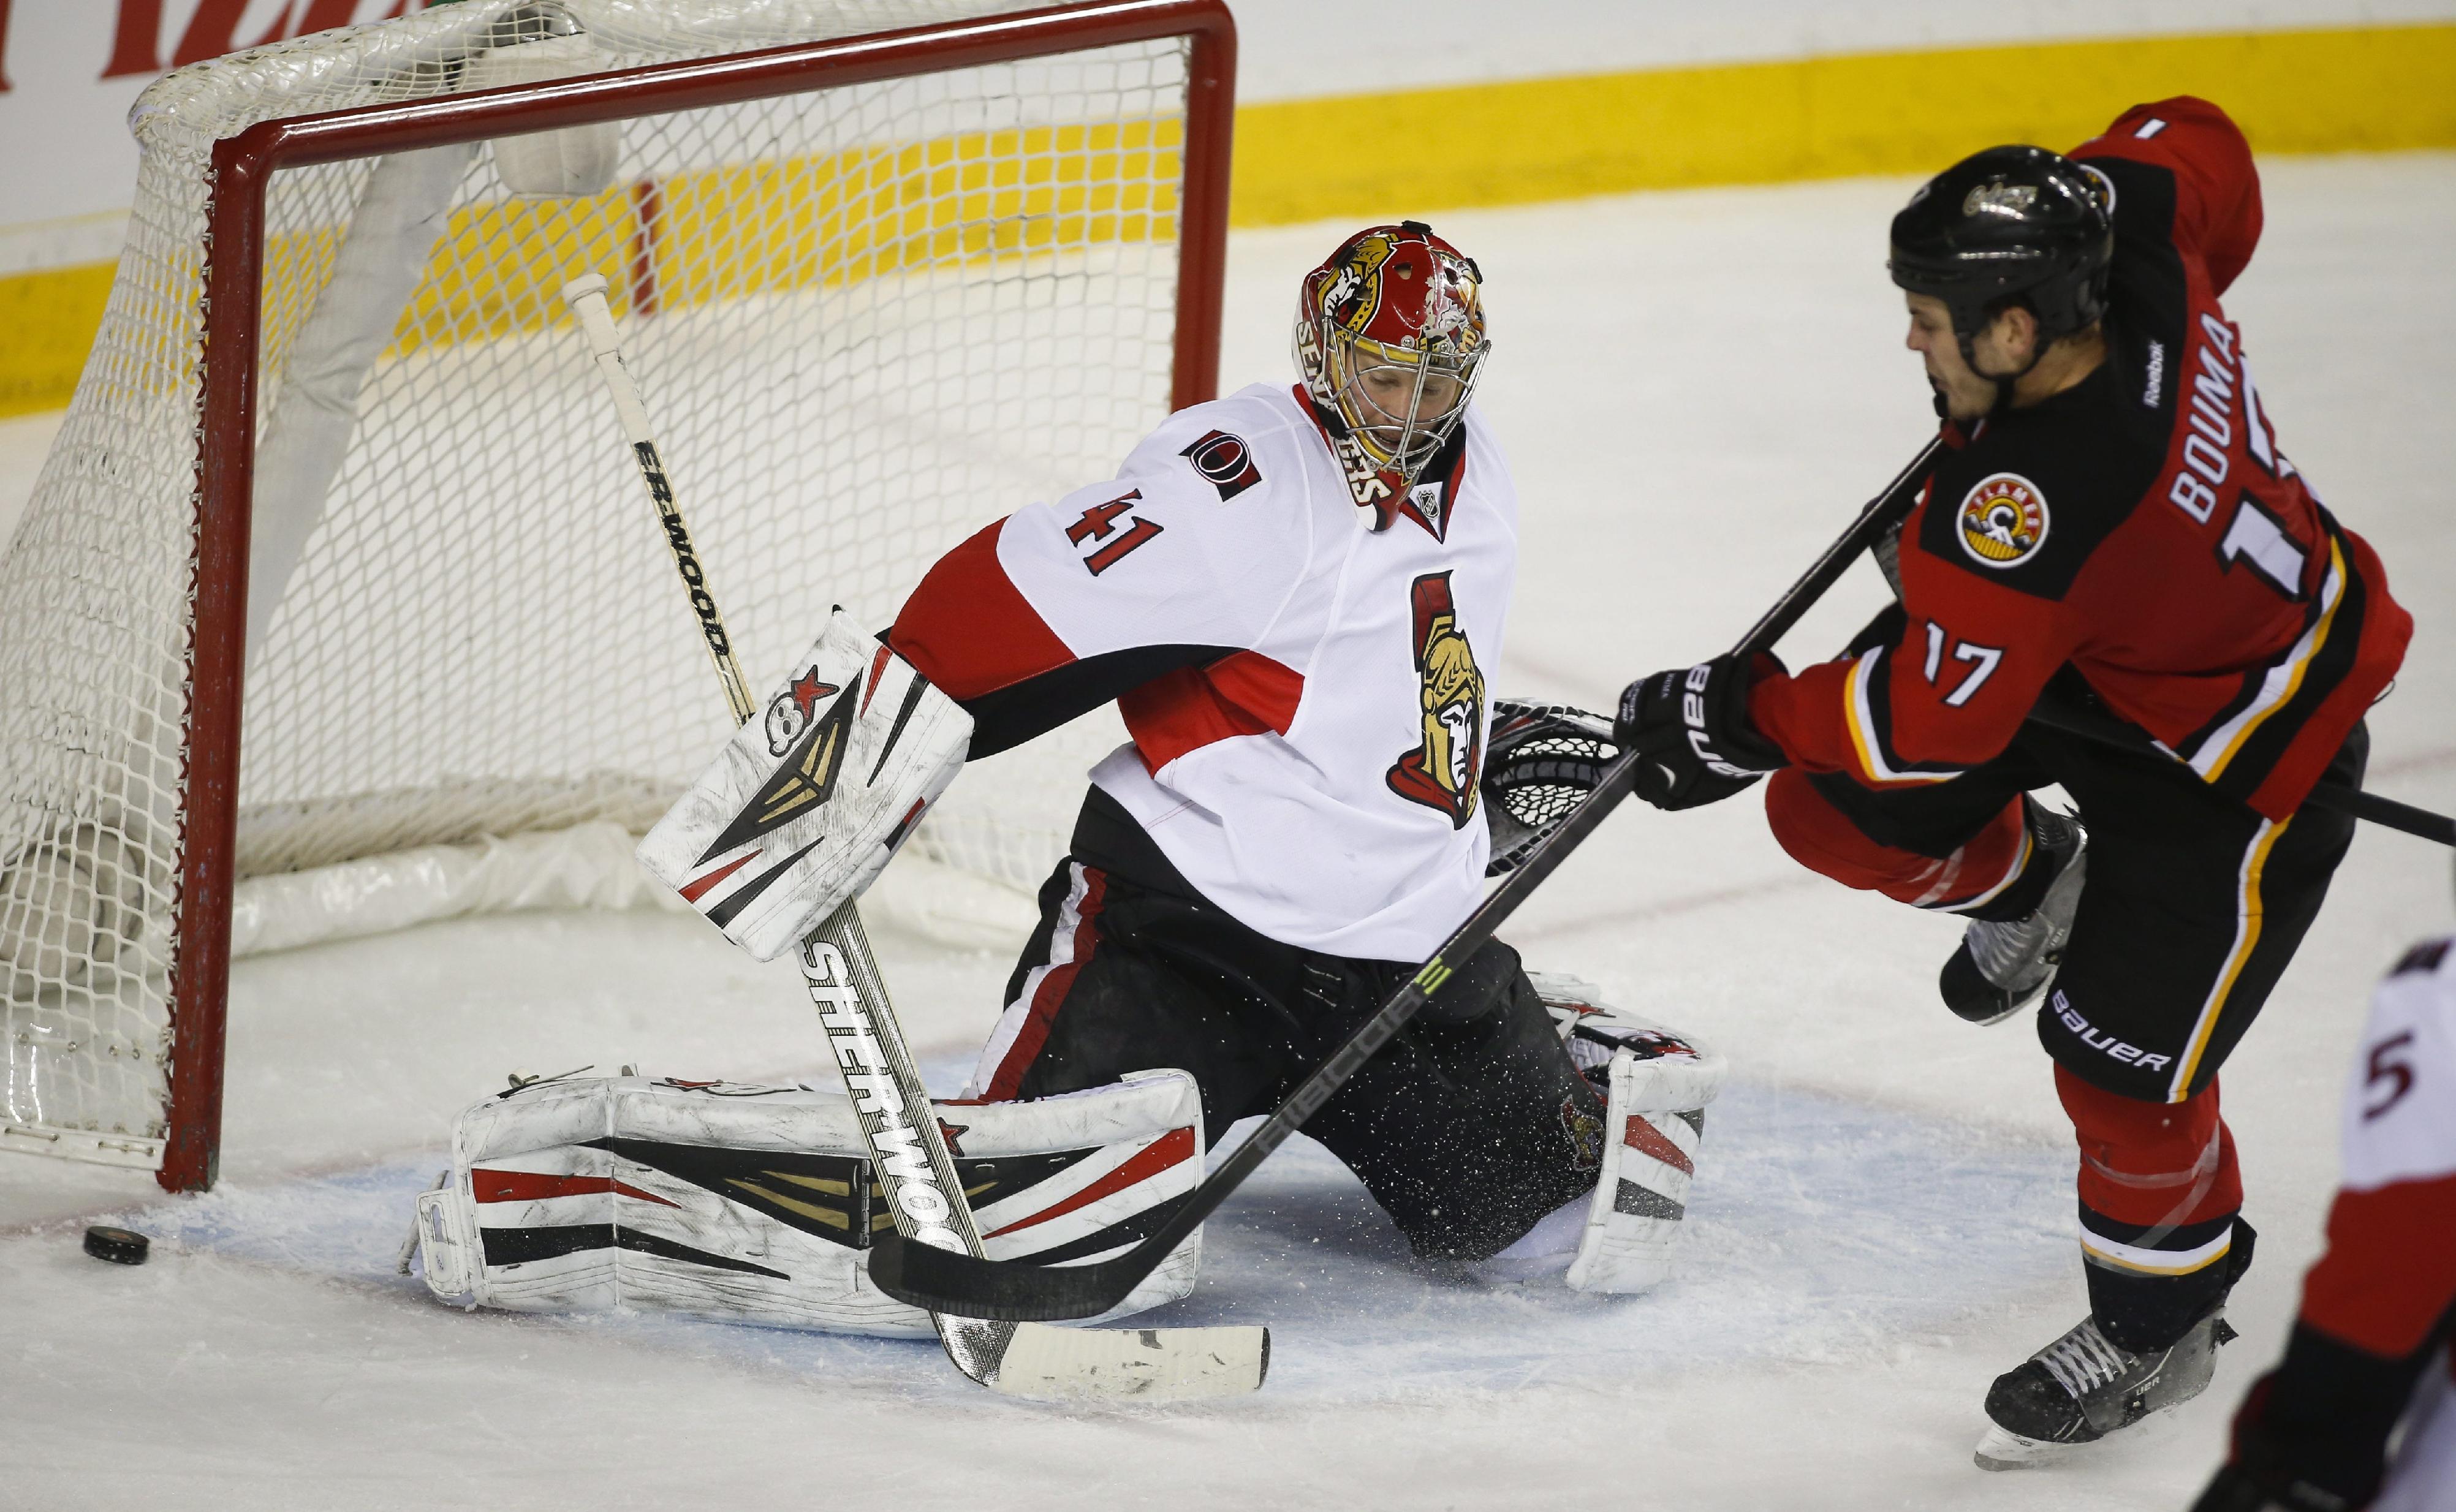 Granlund, Ortio lead Flames past Senators, 4-1